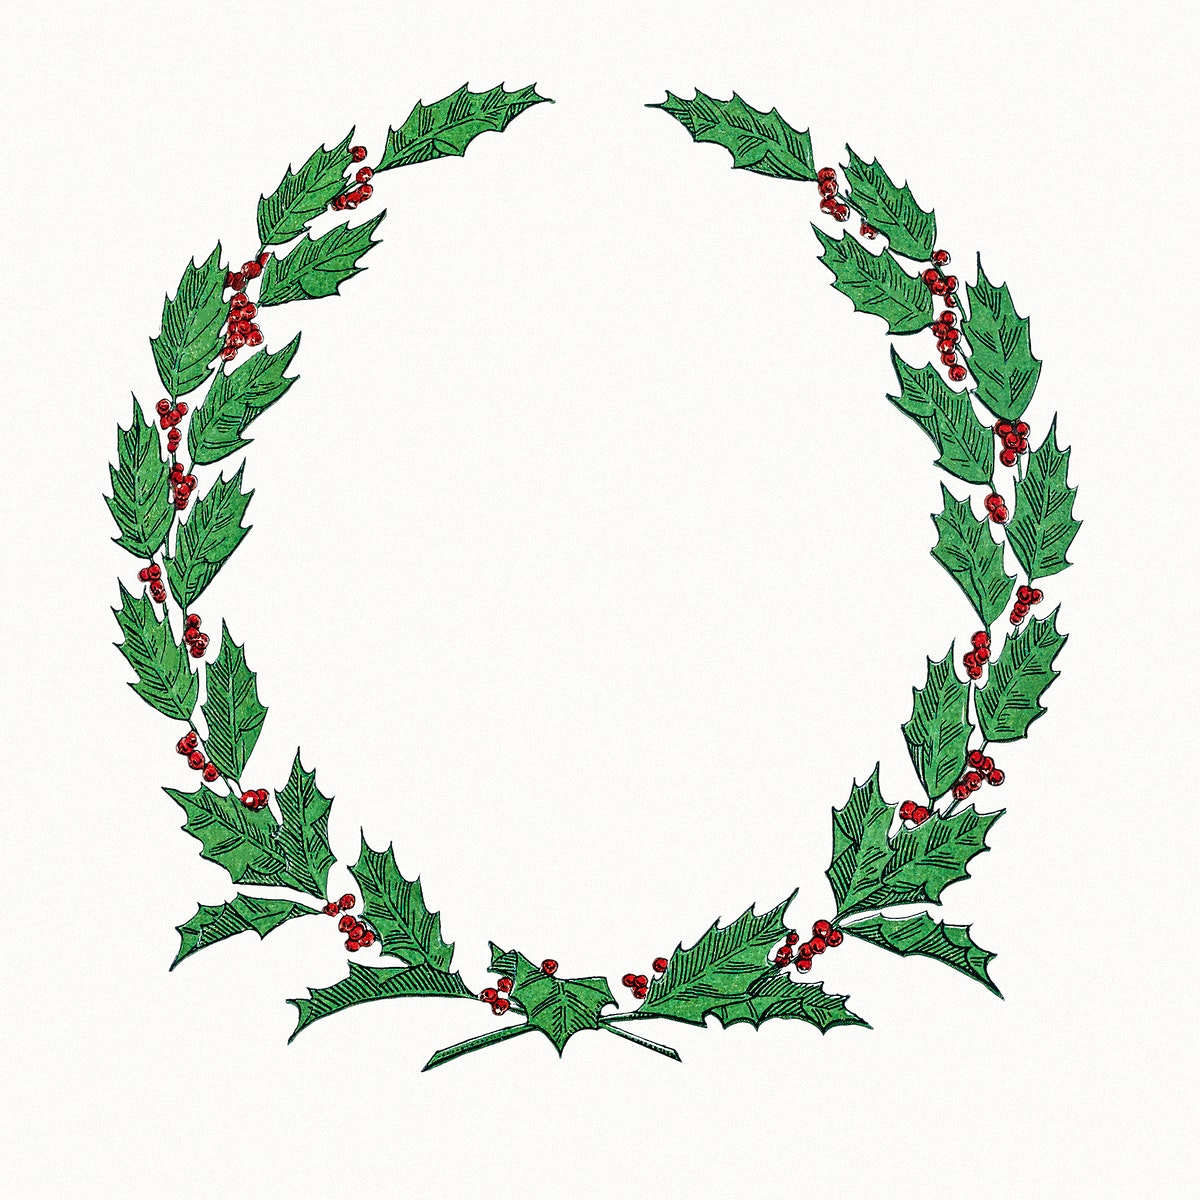 Festive Christmas wreath design illustration